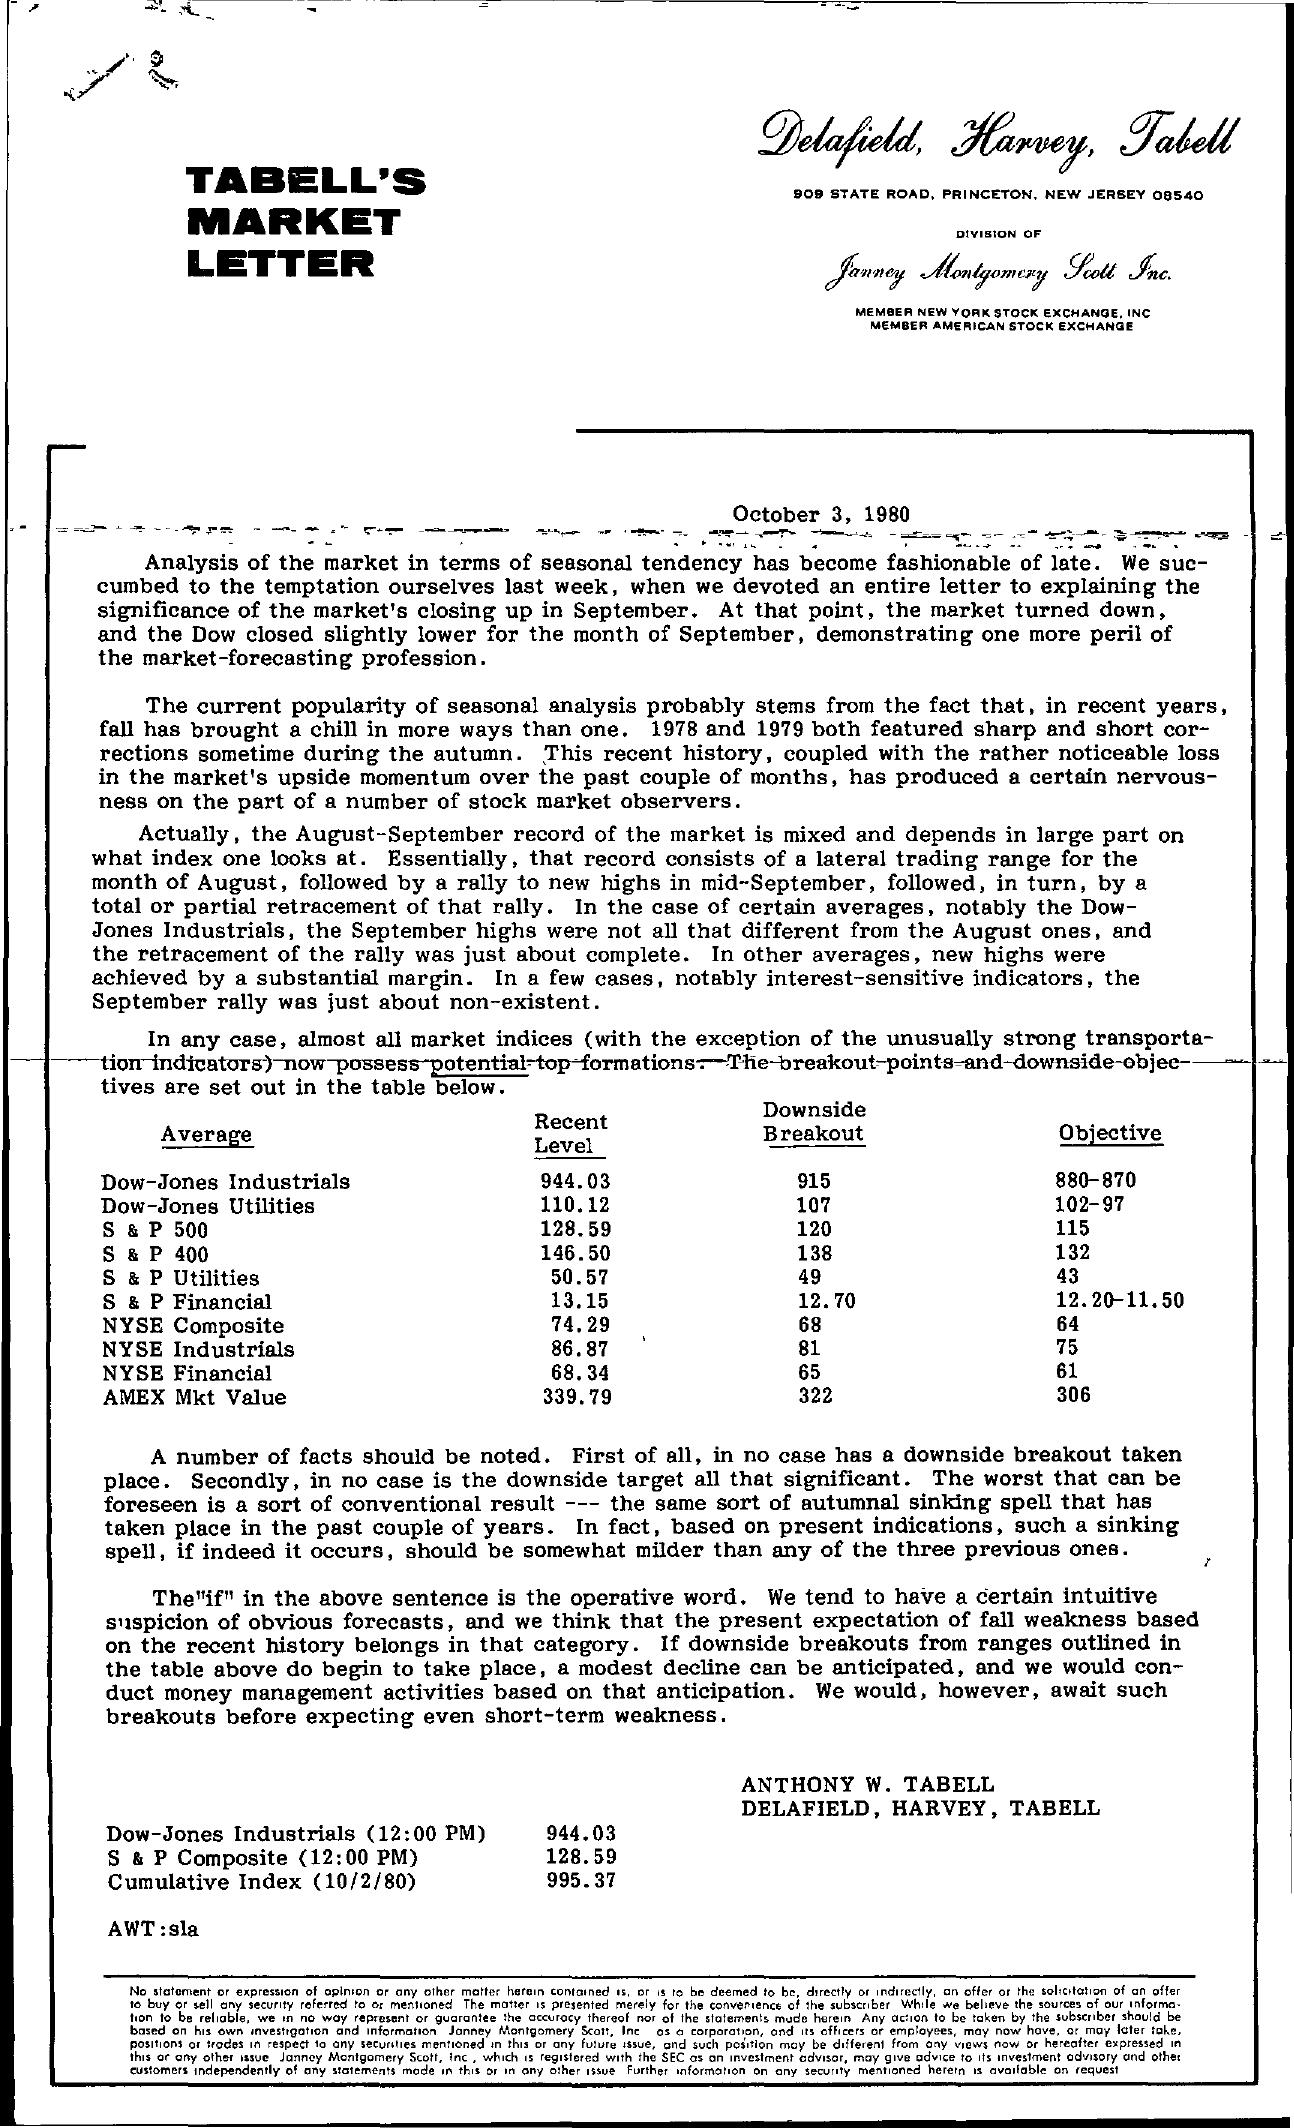 Tabell's Market Letter - October 03, 1980